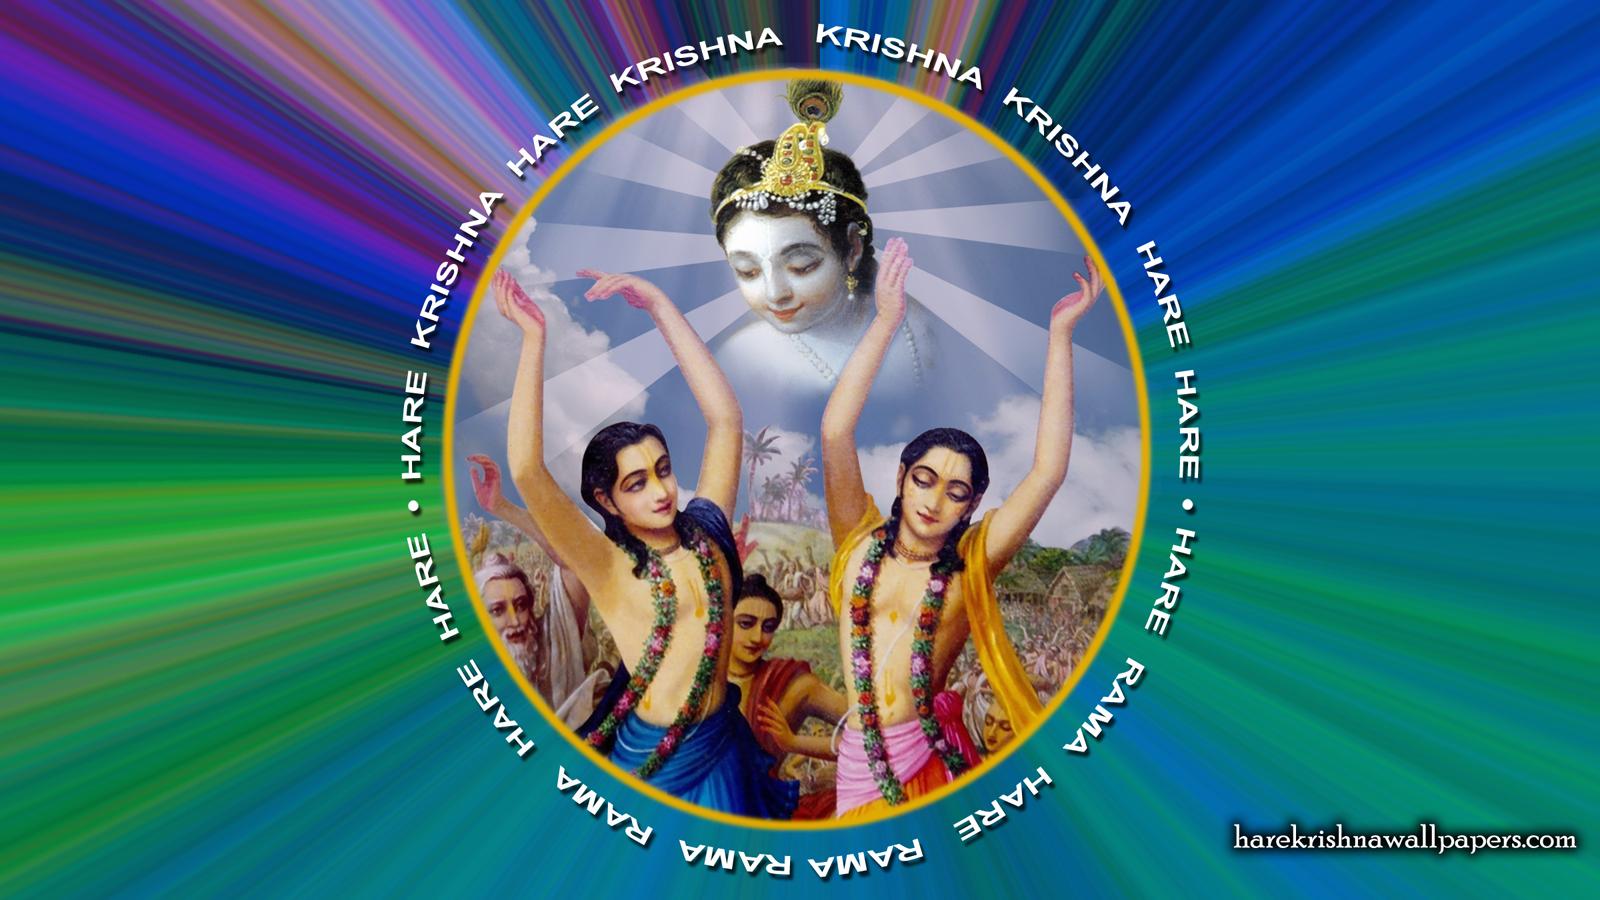 Chant Hare Krishna Mahamantra Wallpaper (003) Size 1600x900 Download